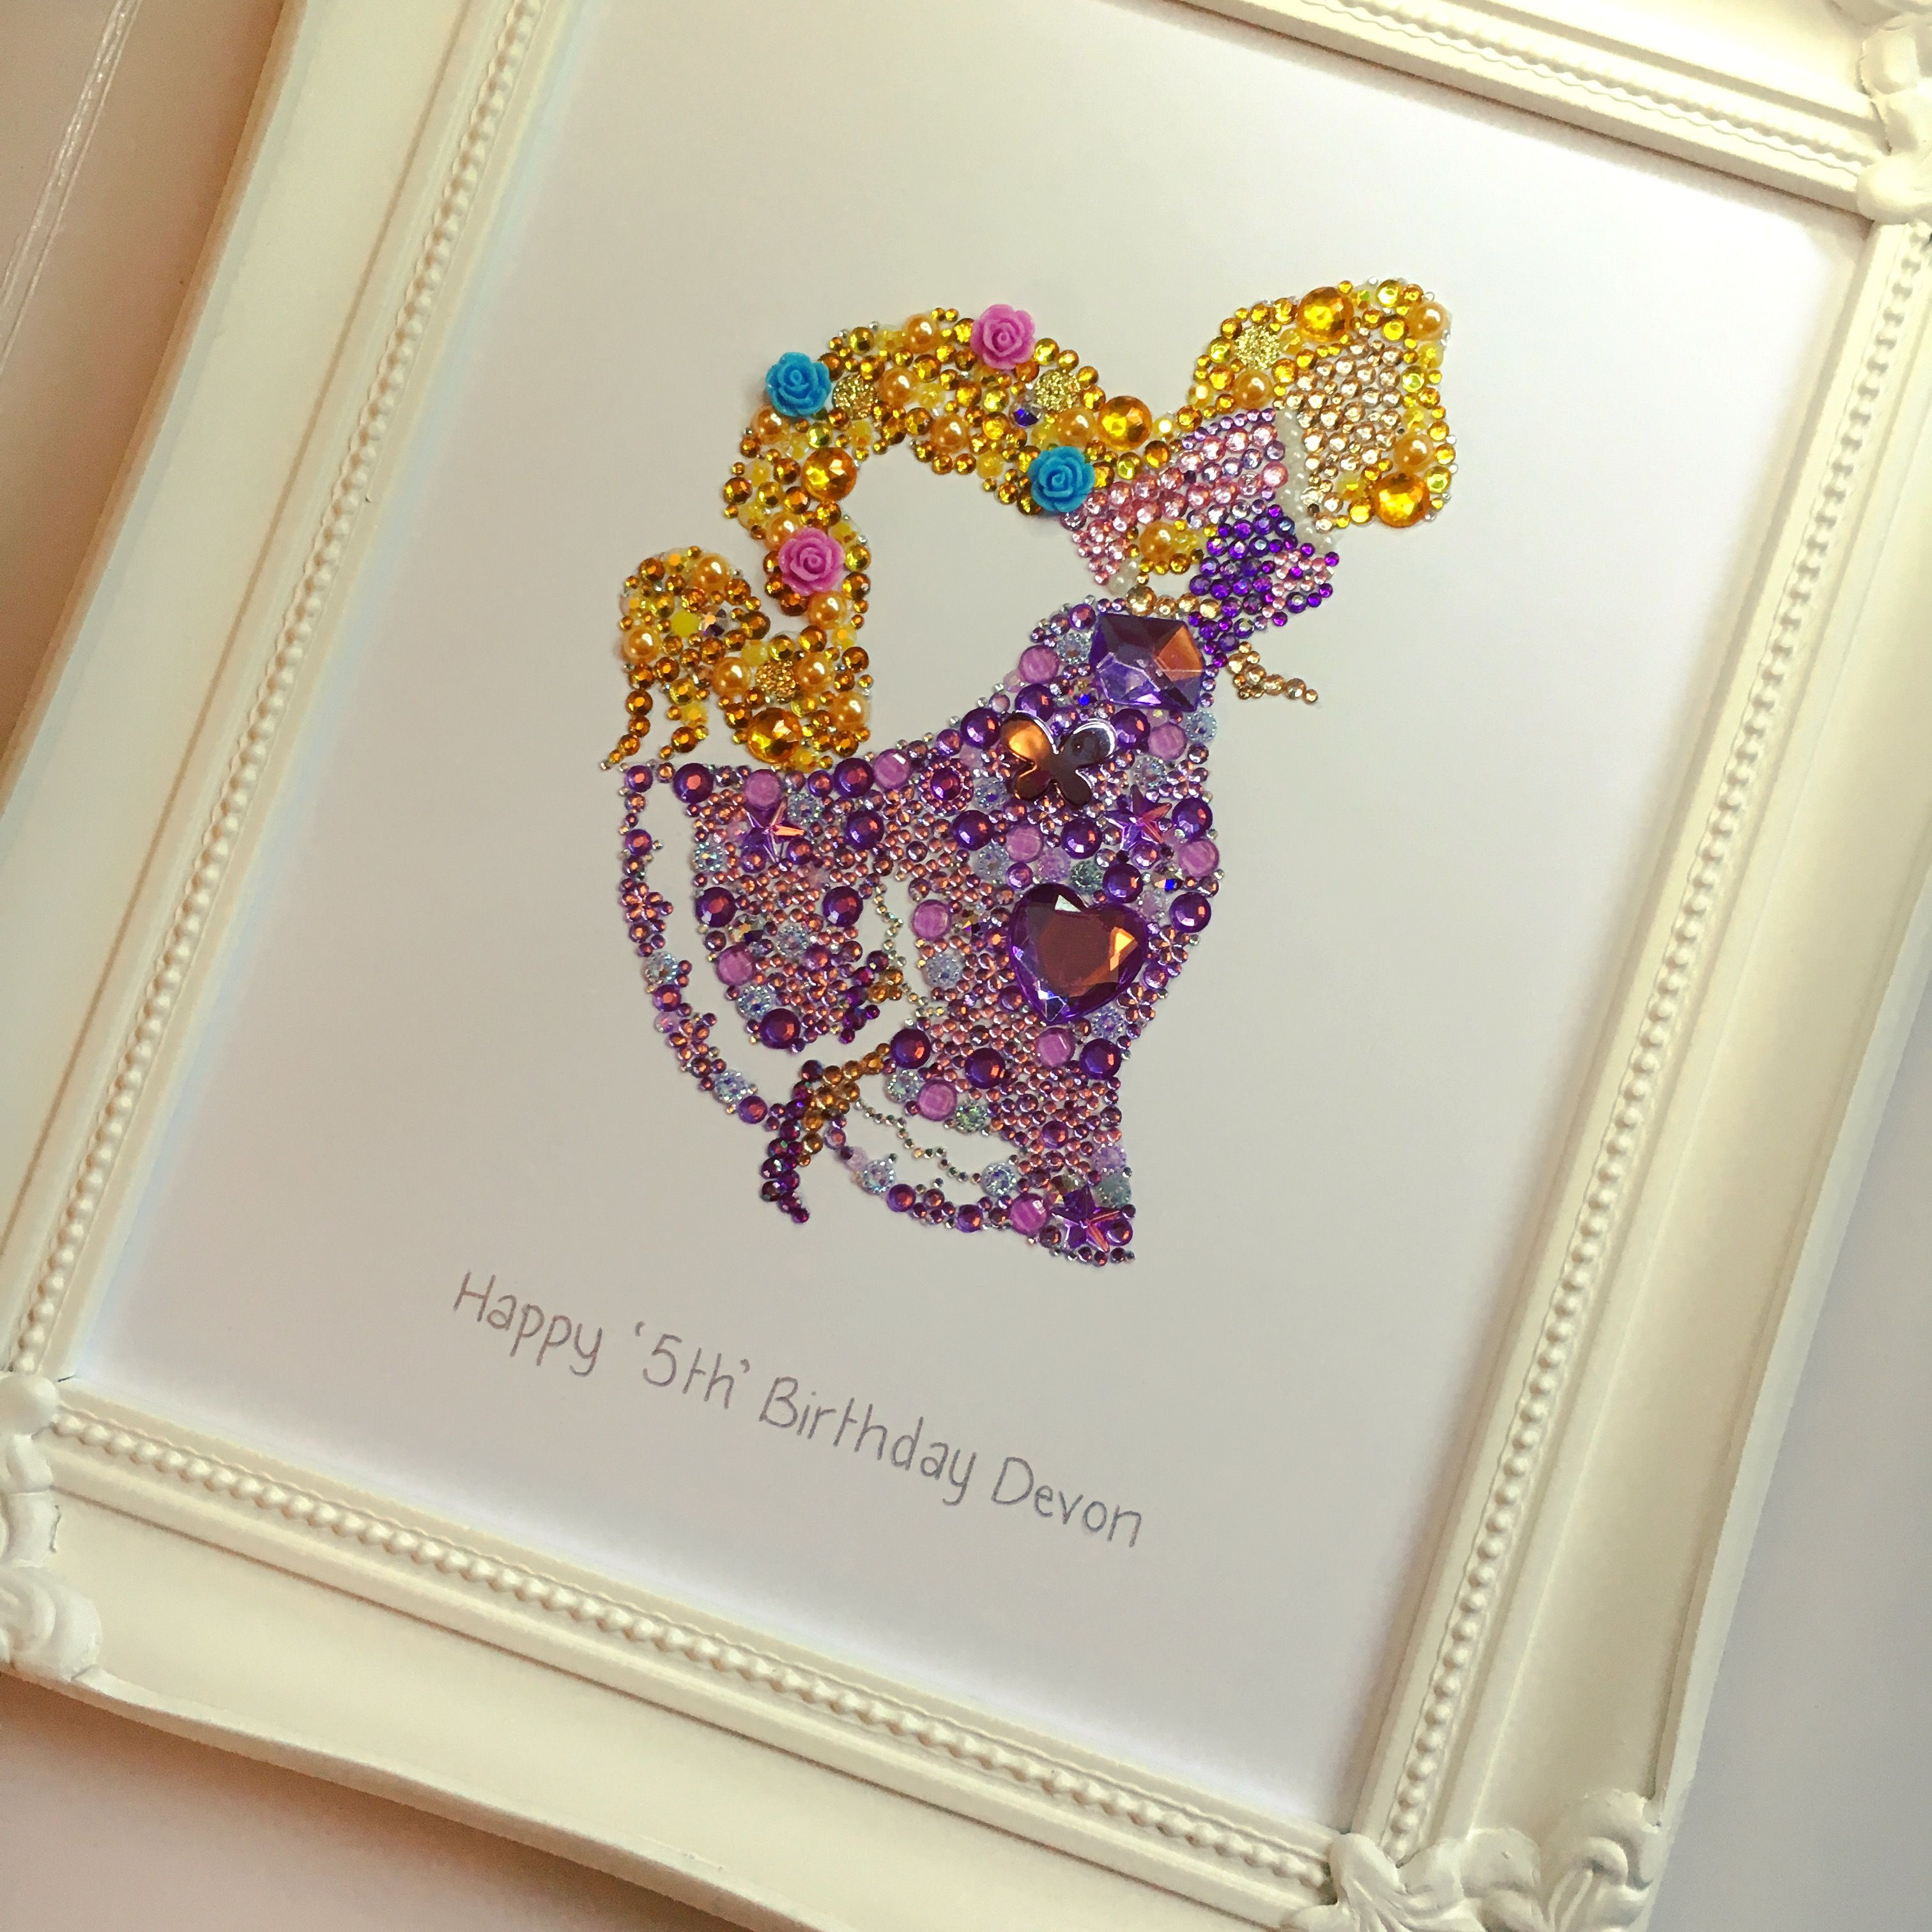 Tangled Rapunzel Button Art Button Picture Swarovski Crystal Picture Disney Princess Princess Gifts Gi Disney Button Art Button Art Disney Handmade Gifts